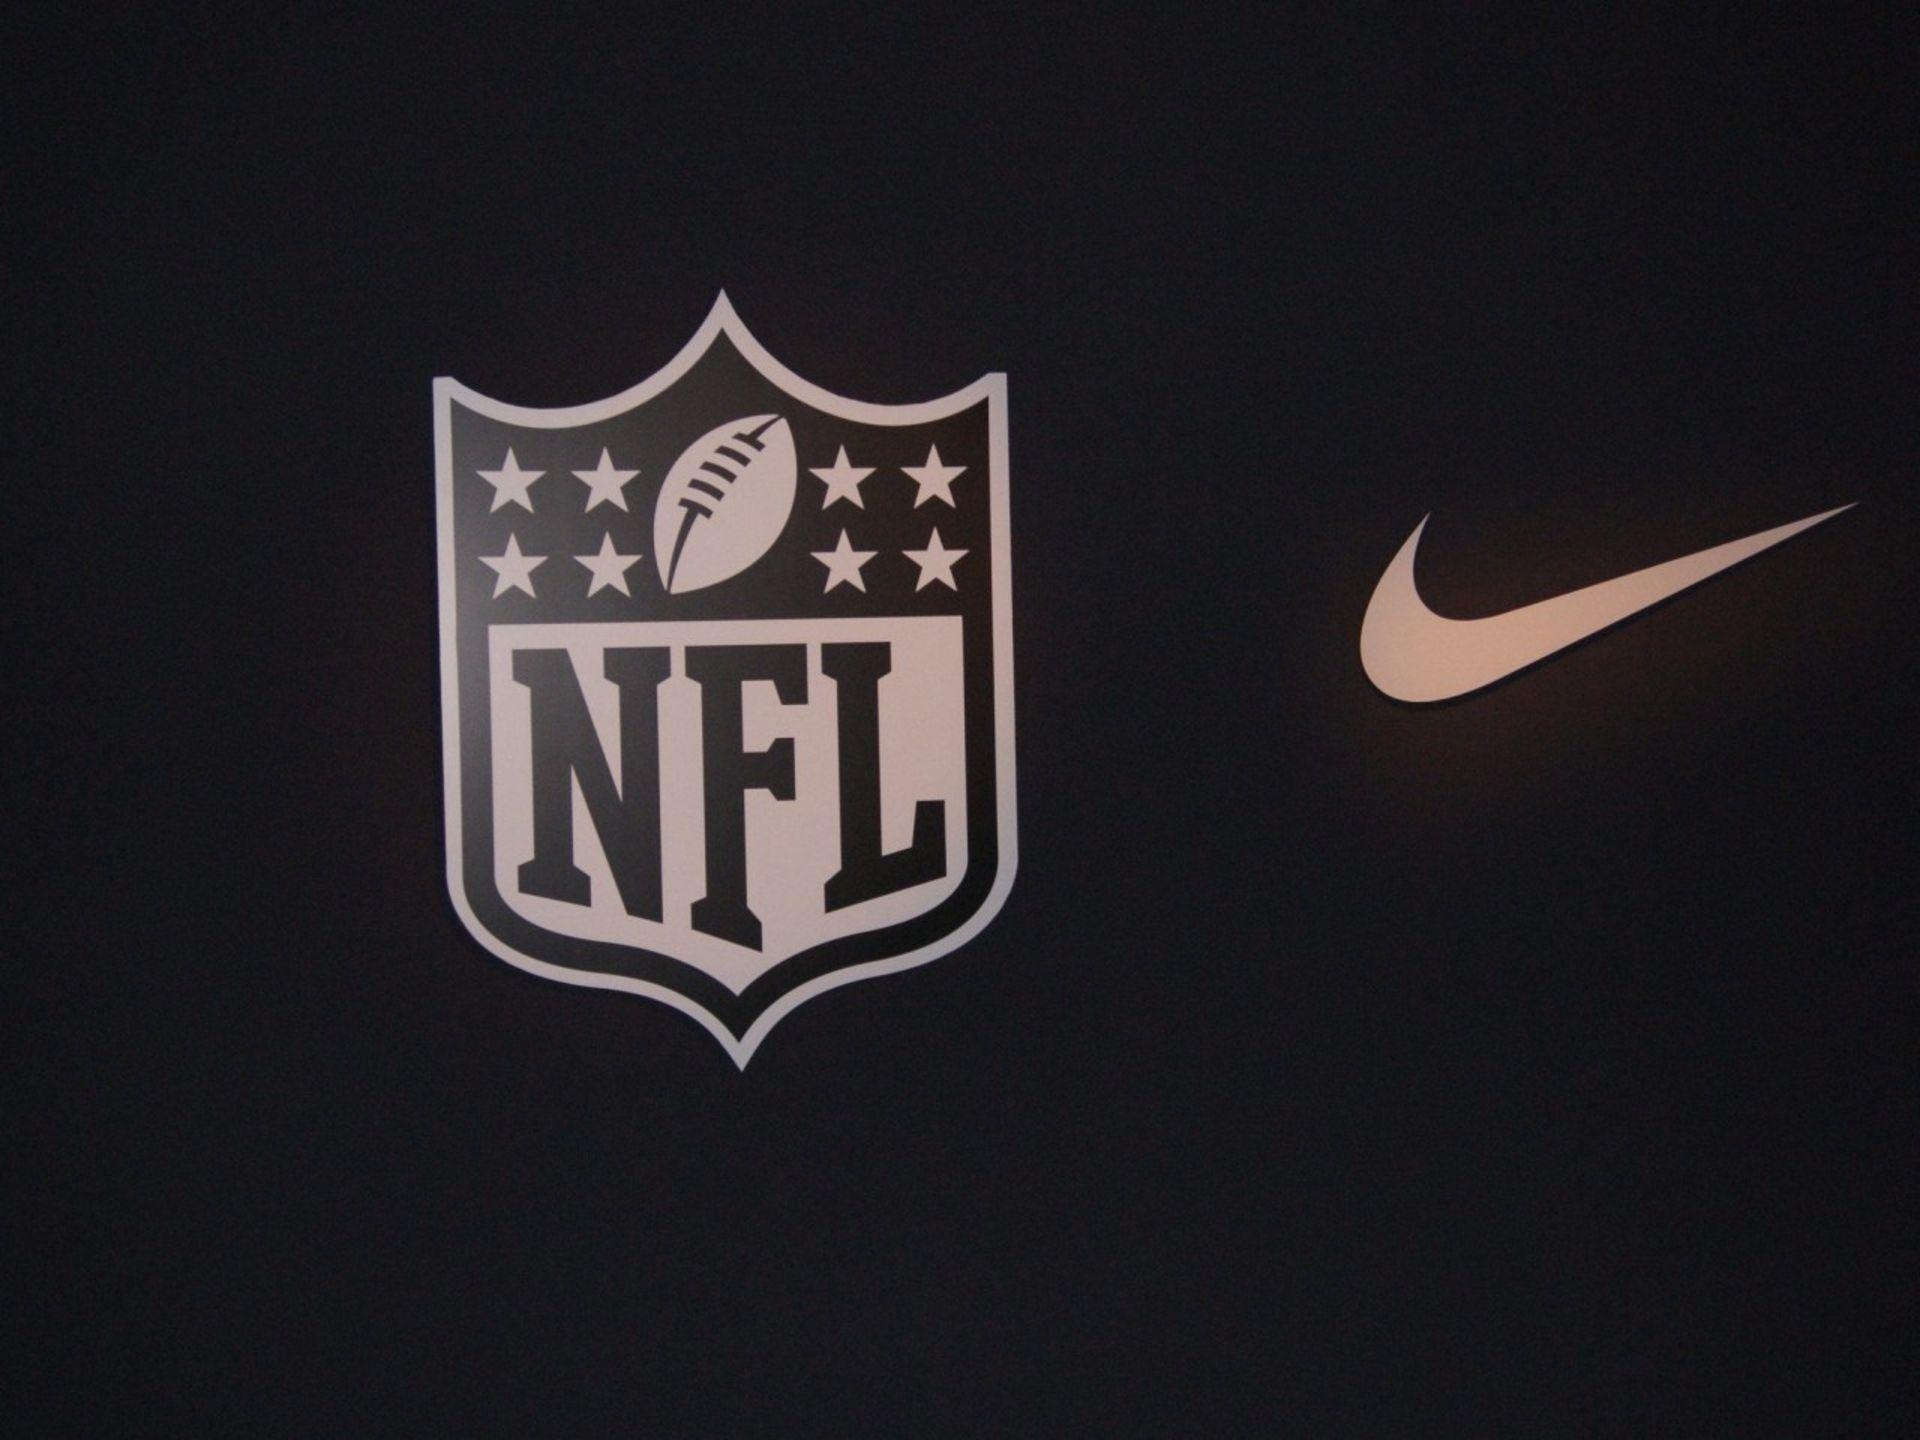 футбол 1 Wallpaper: Nike Football Wallpaper Wallpapers For Laptops Amazing